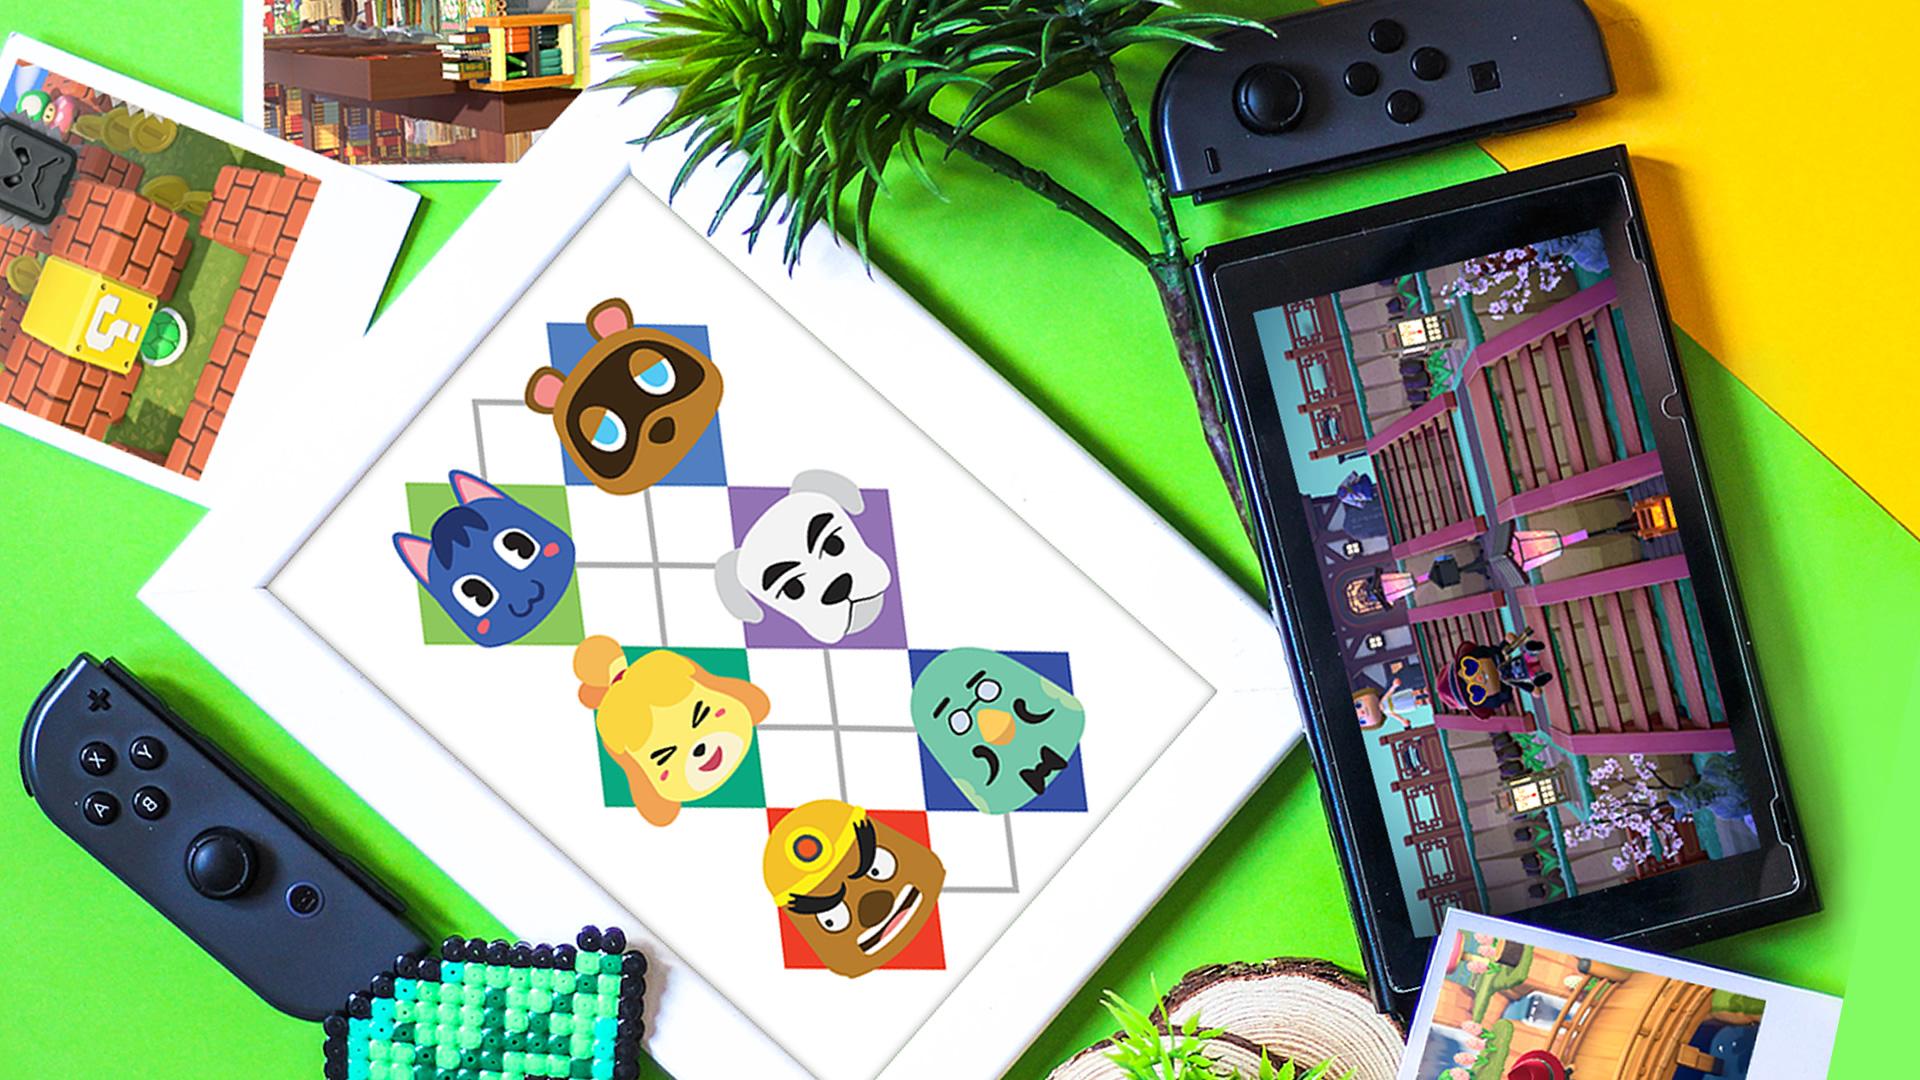 More Amazing Animal Crossing Dream Islands to Visit